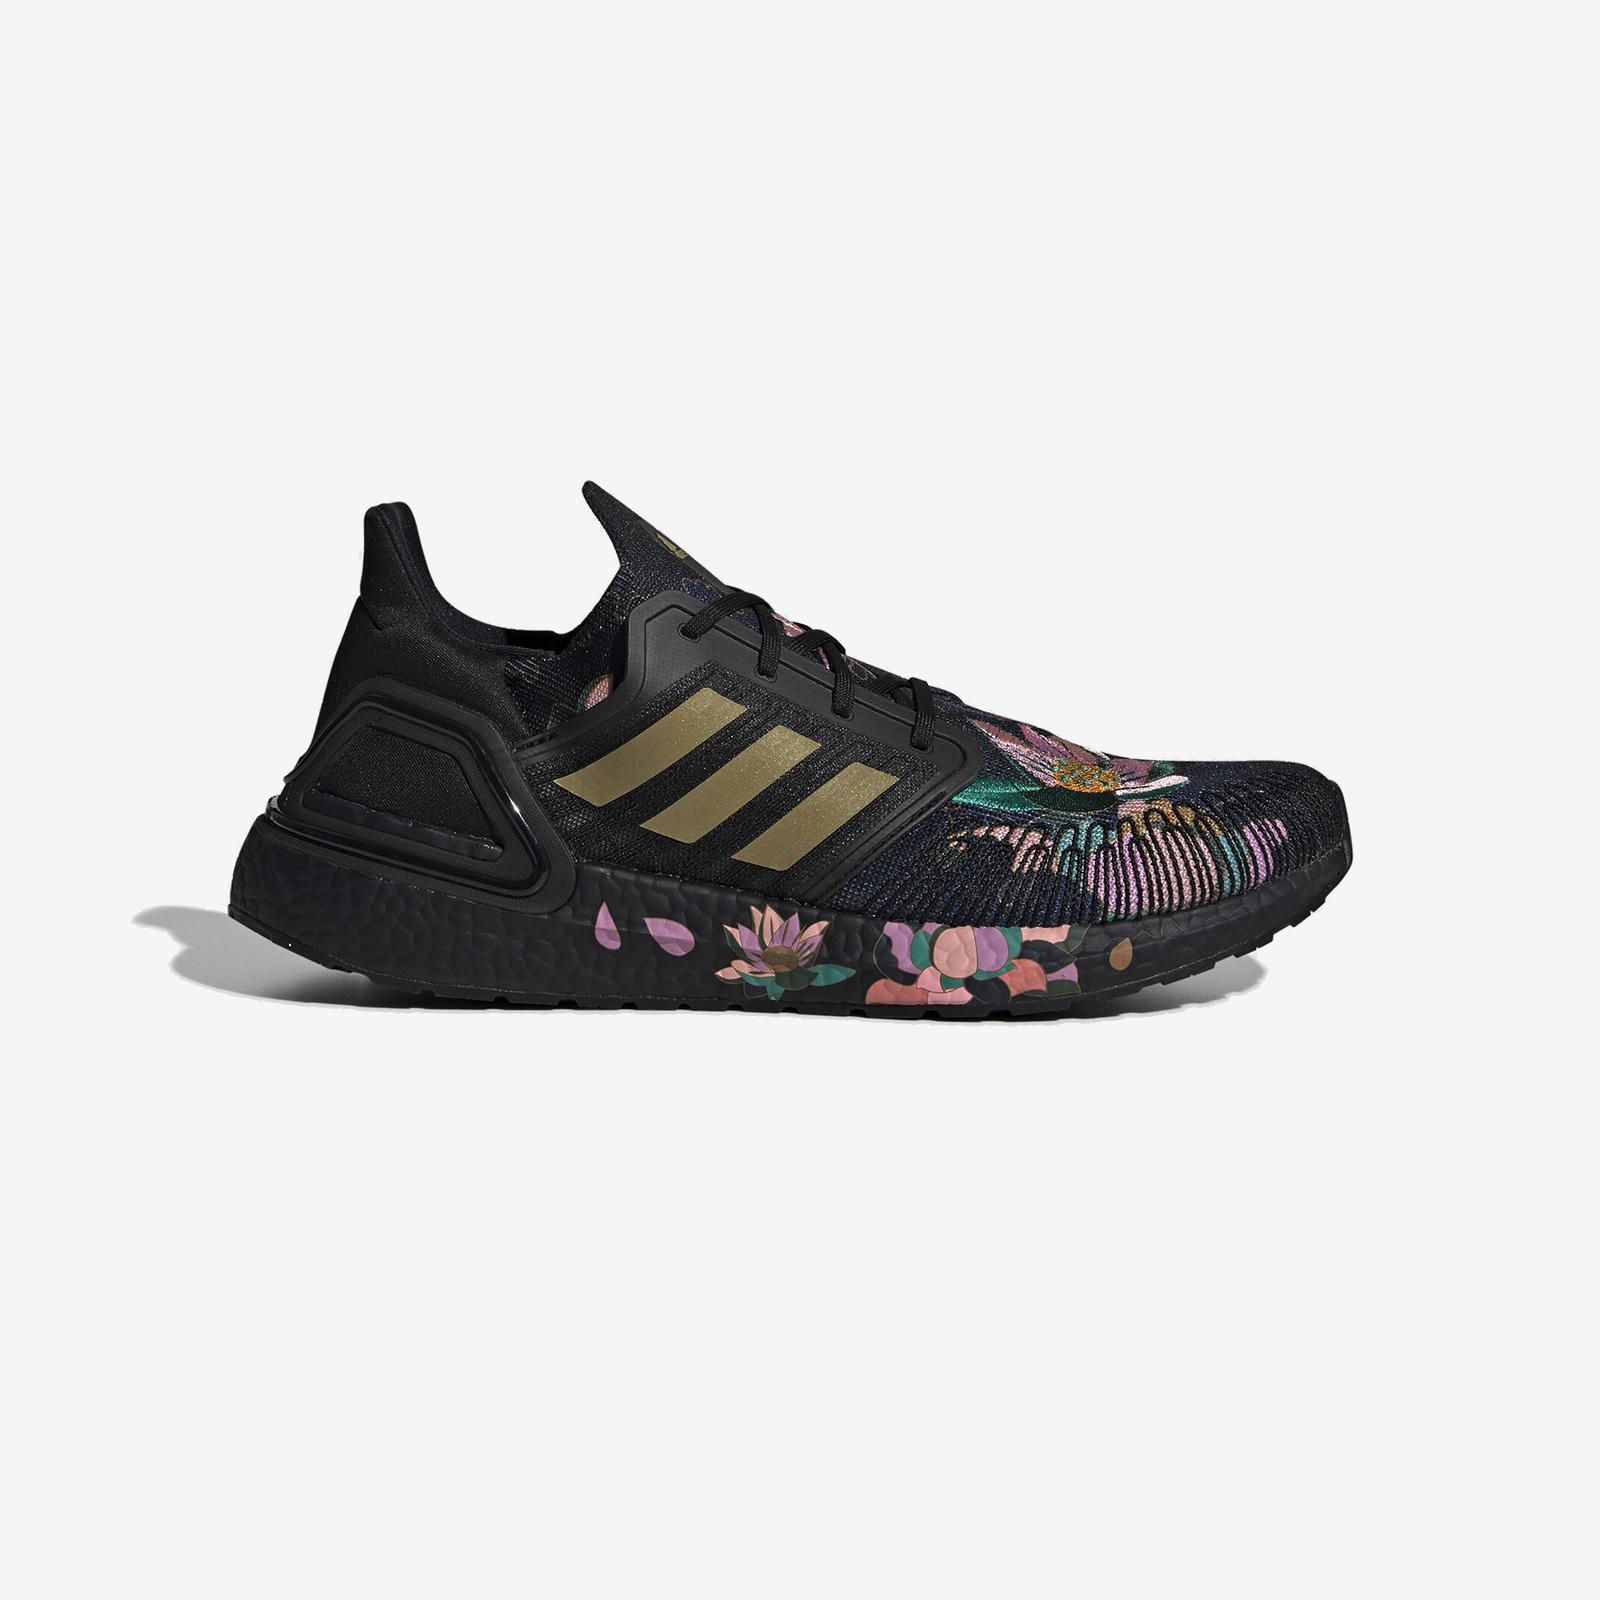 adidas UltraBOOST 20 Fw4310 Sneakersnstuff I Sneakers